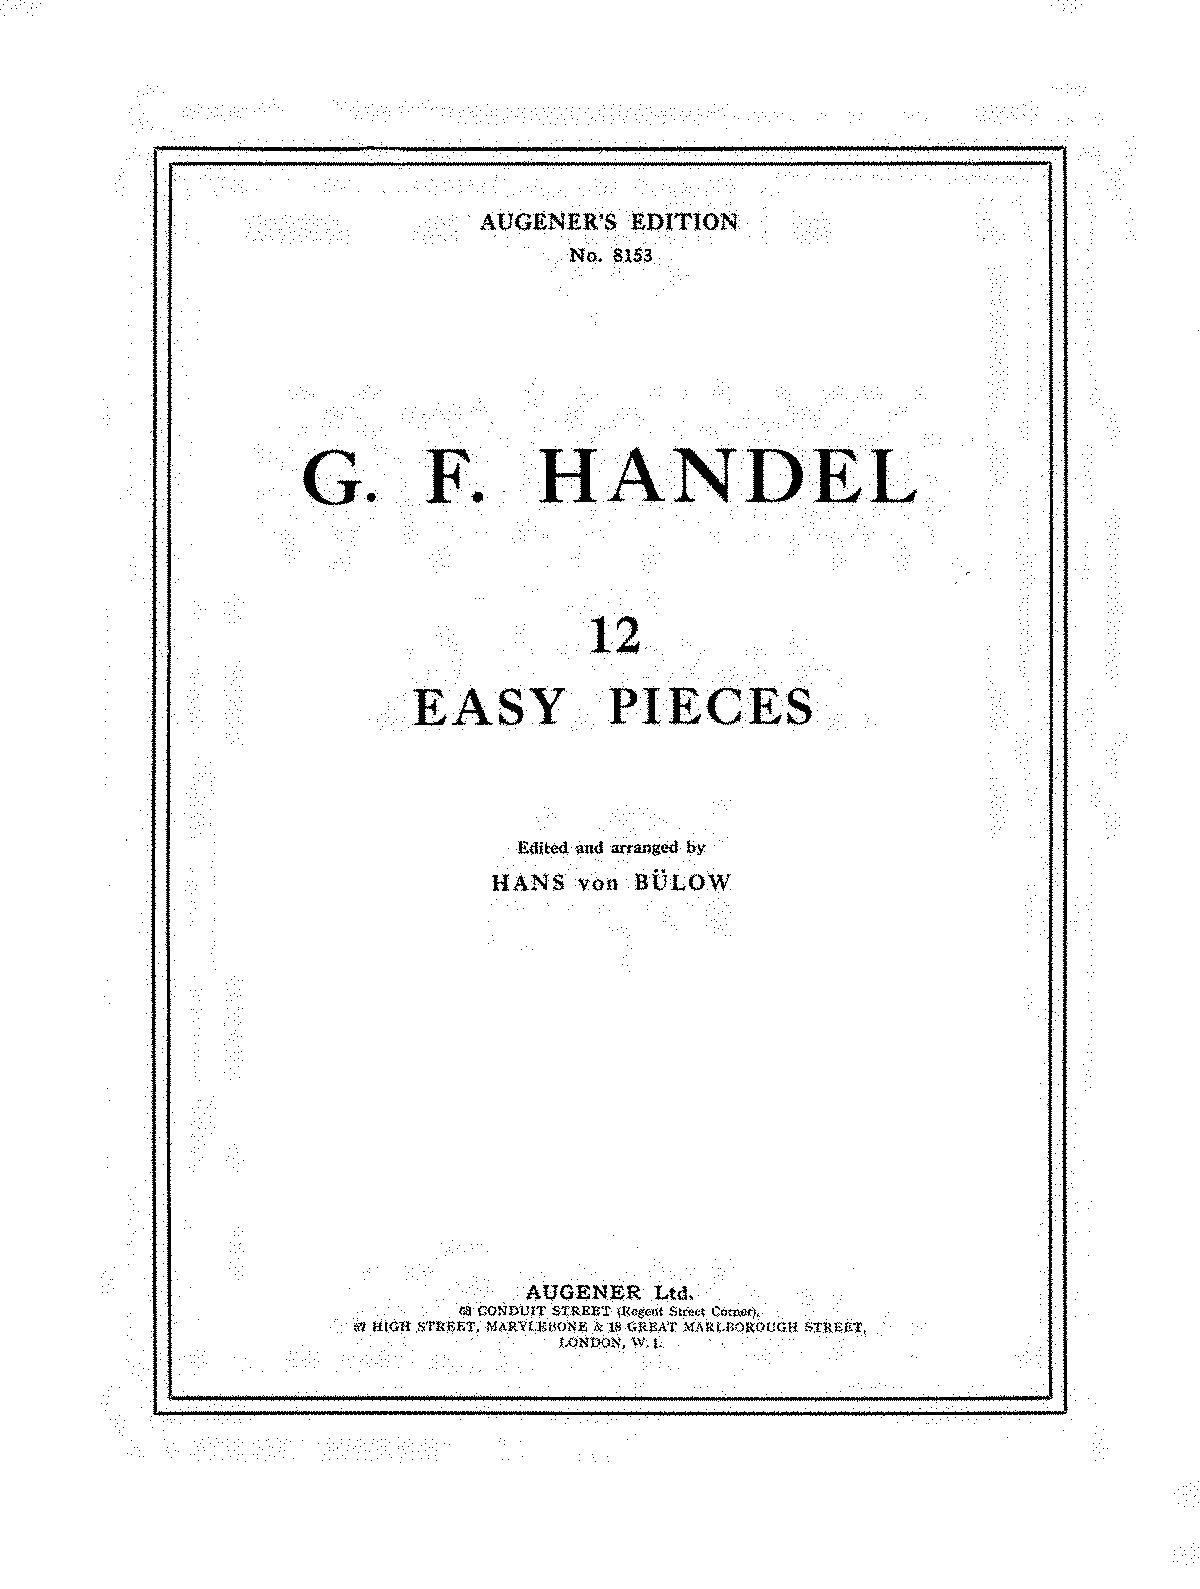 12 Easy Pieces (Handel, George Frideric) - IMSLP/Petrucci Music ...